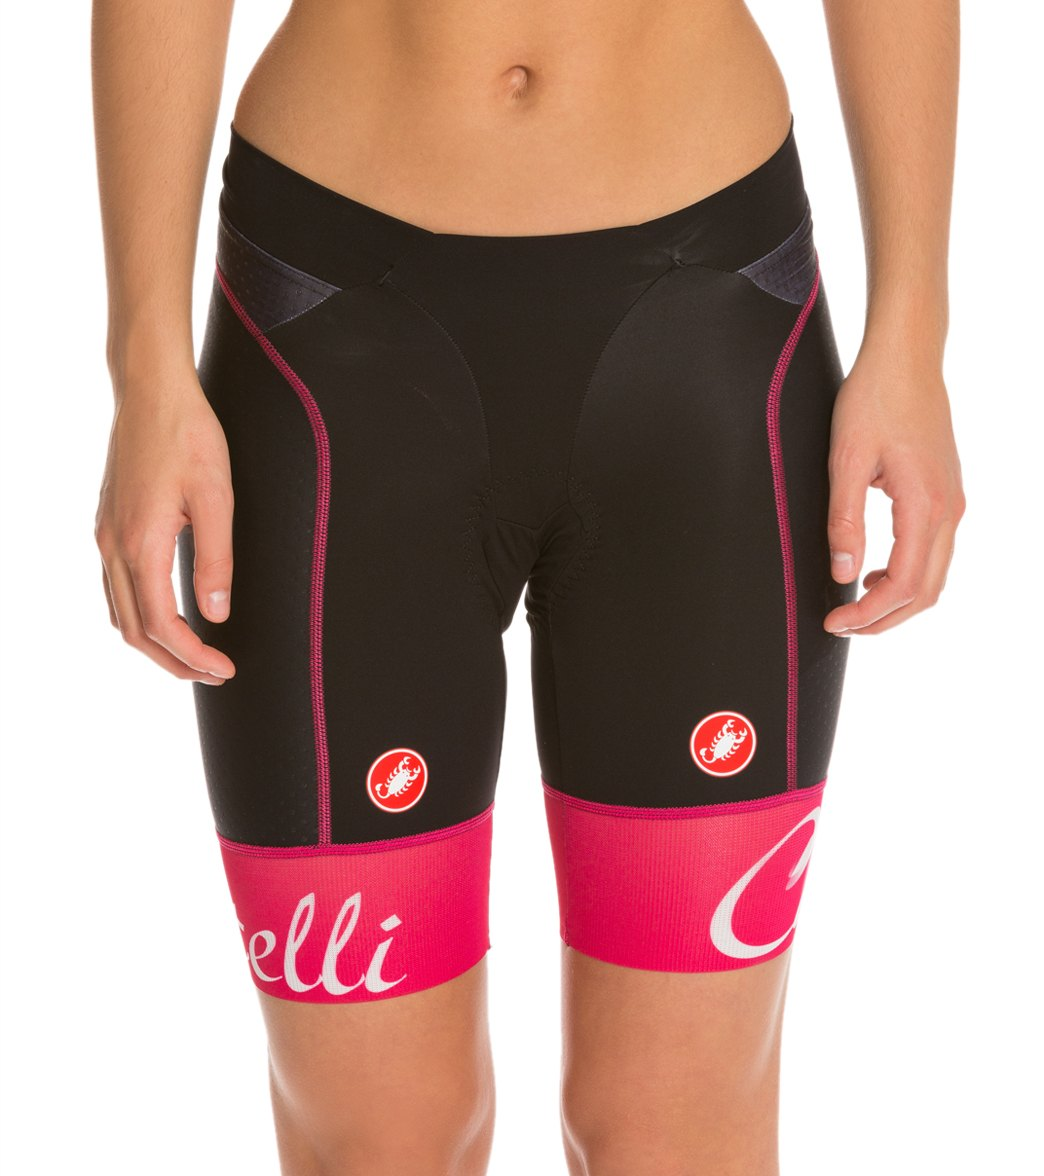 32418b78be3 Castelli Women s Free Aero Cycling Short at SwimOutlet.com - Free Shipping